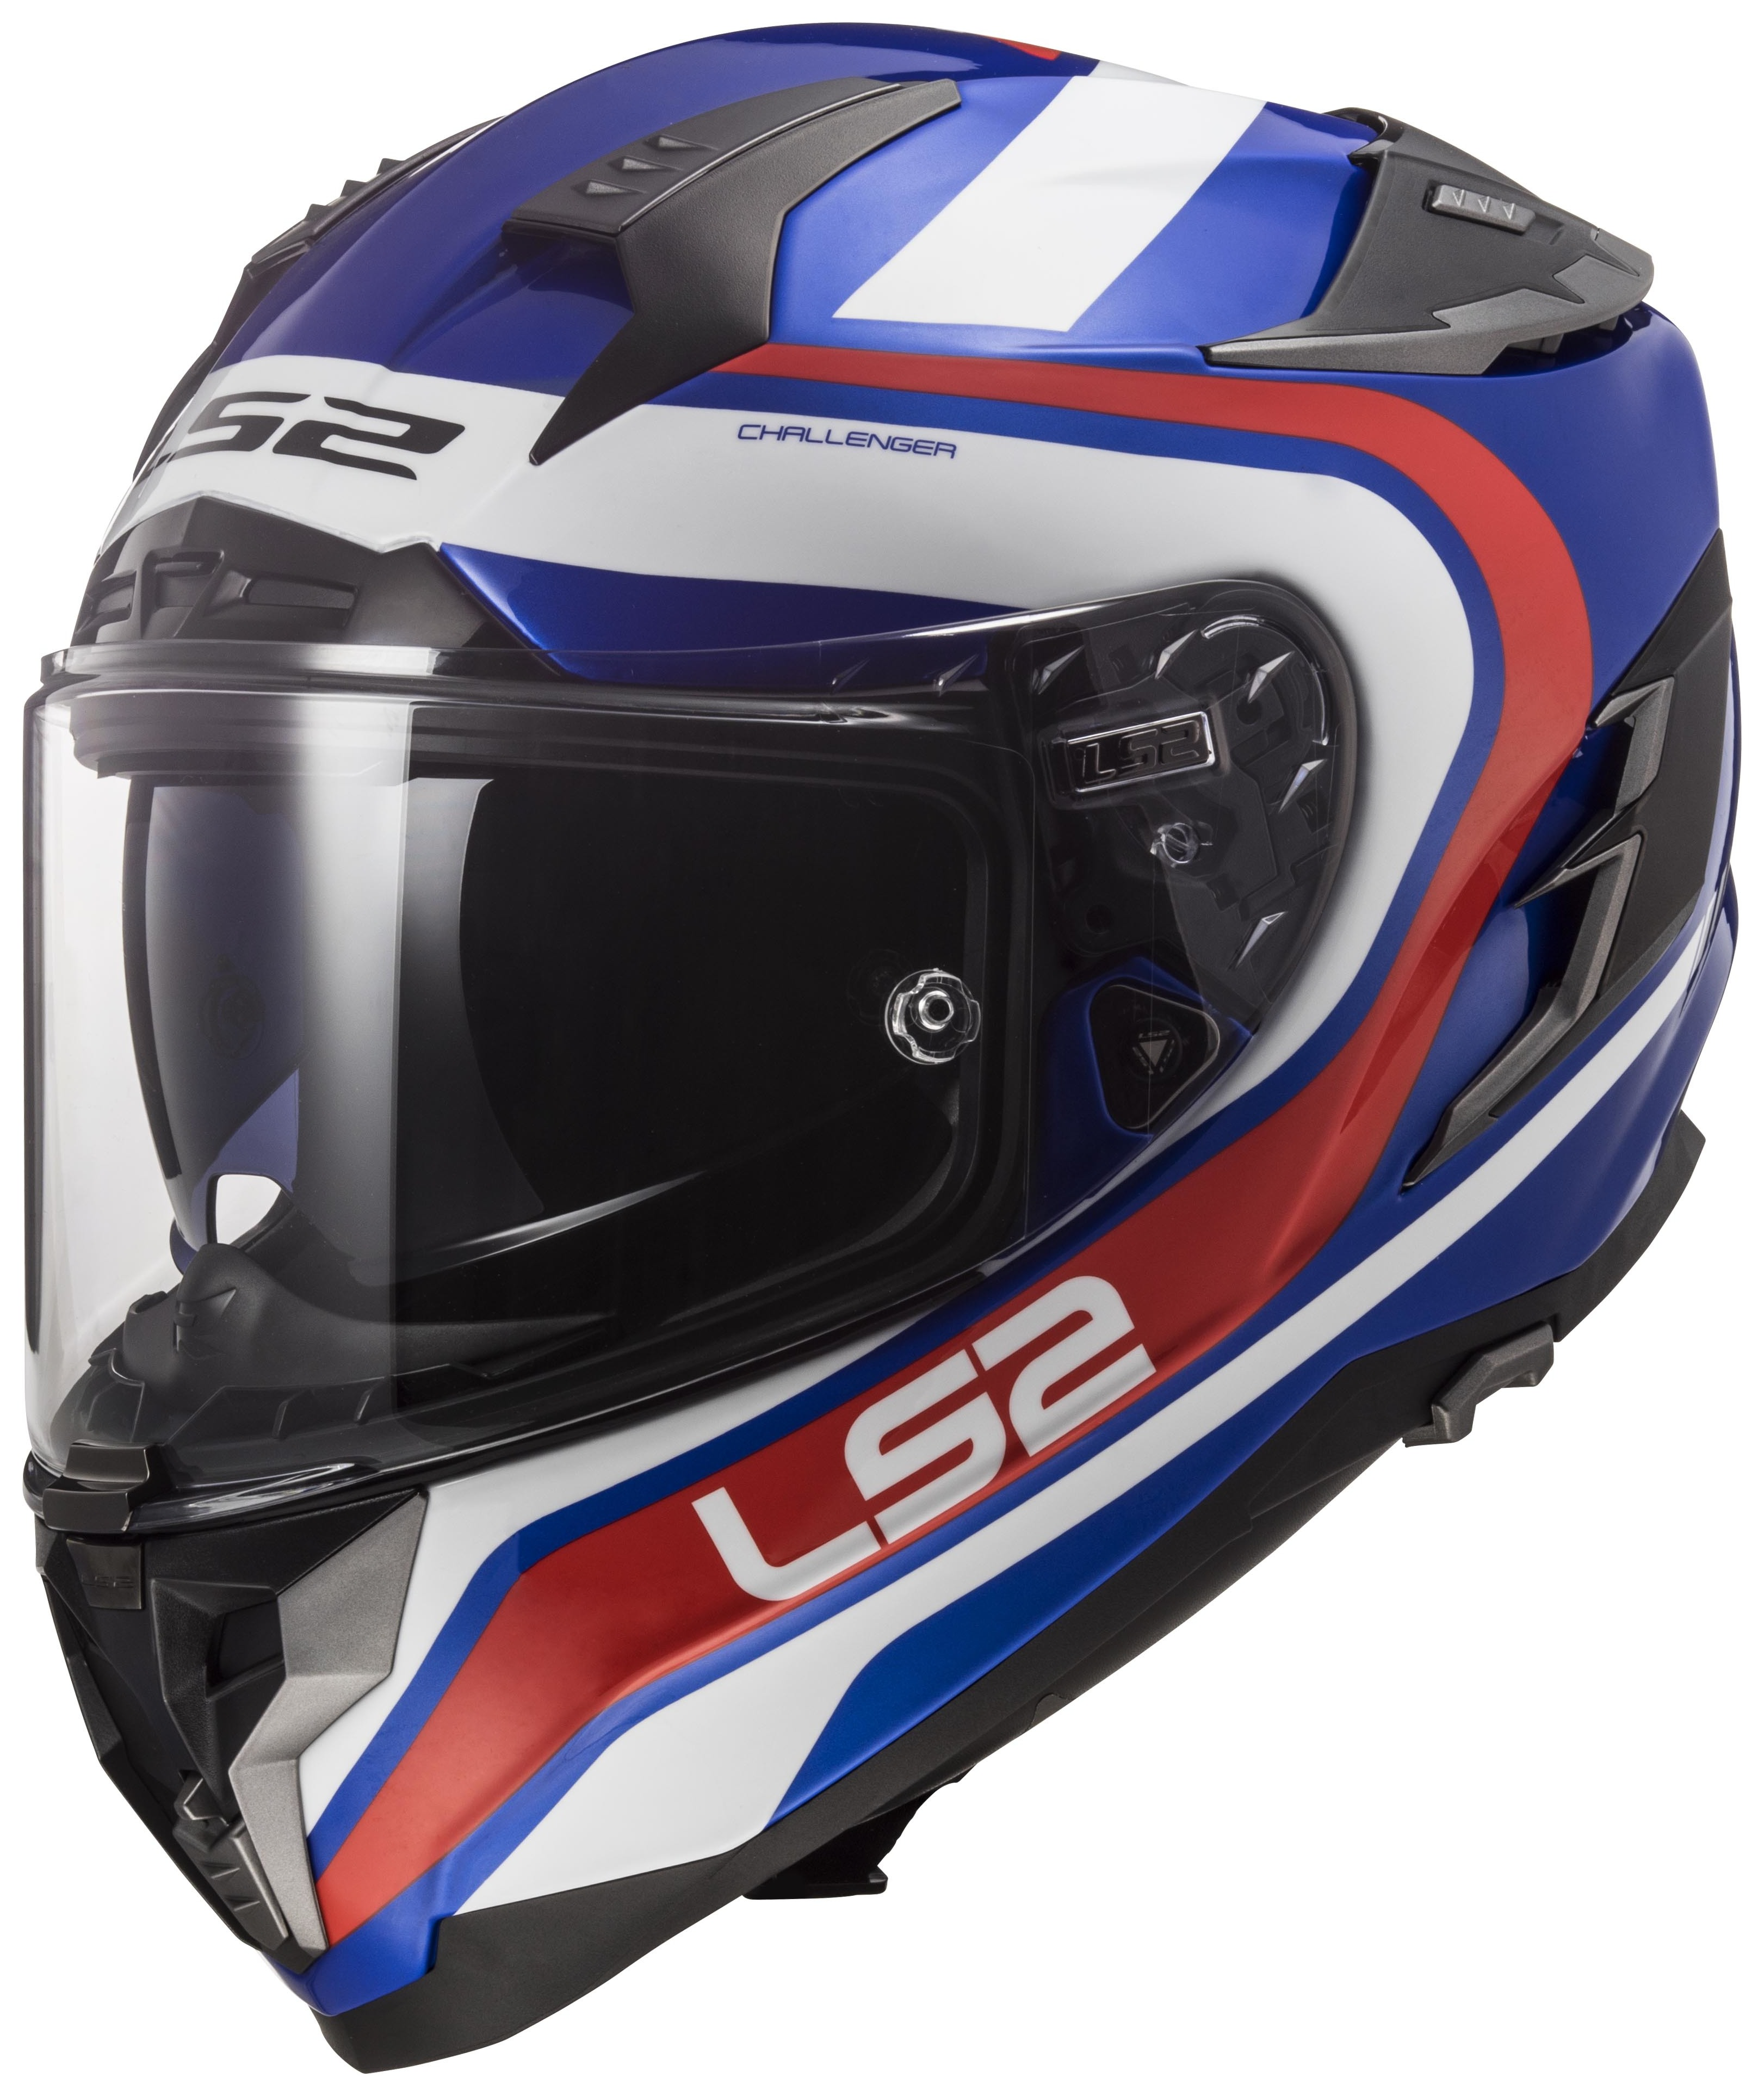 Ls2 challenger gt fusion helmet revzilla